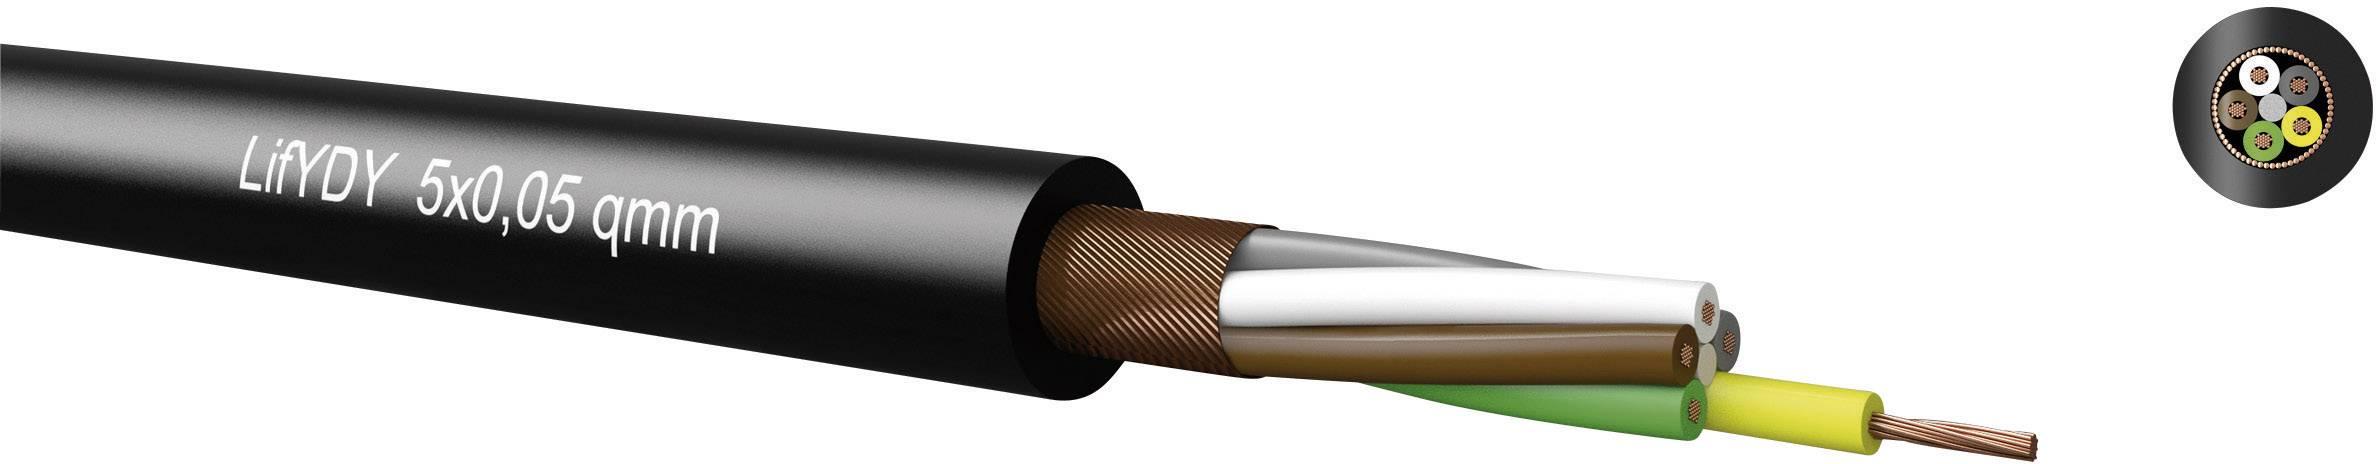 Riadiaci kábel Kabeltronik LifYDY 340401000, 4 x 0.10 mm², vonkajší Ø 4 mm, 300 V, metrový tovar, čierna